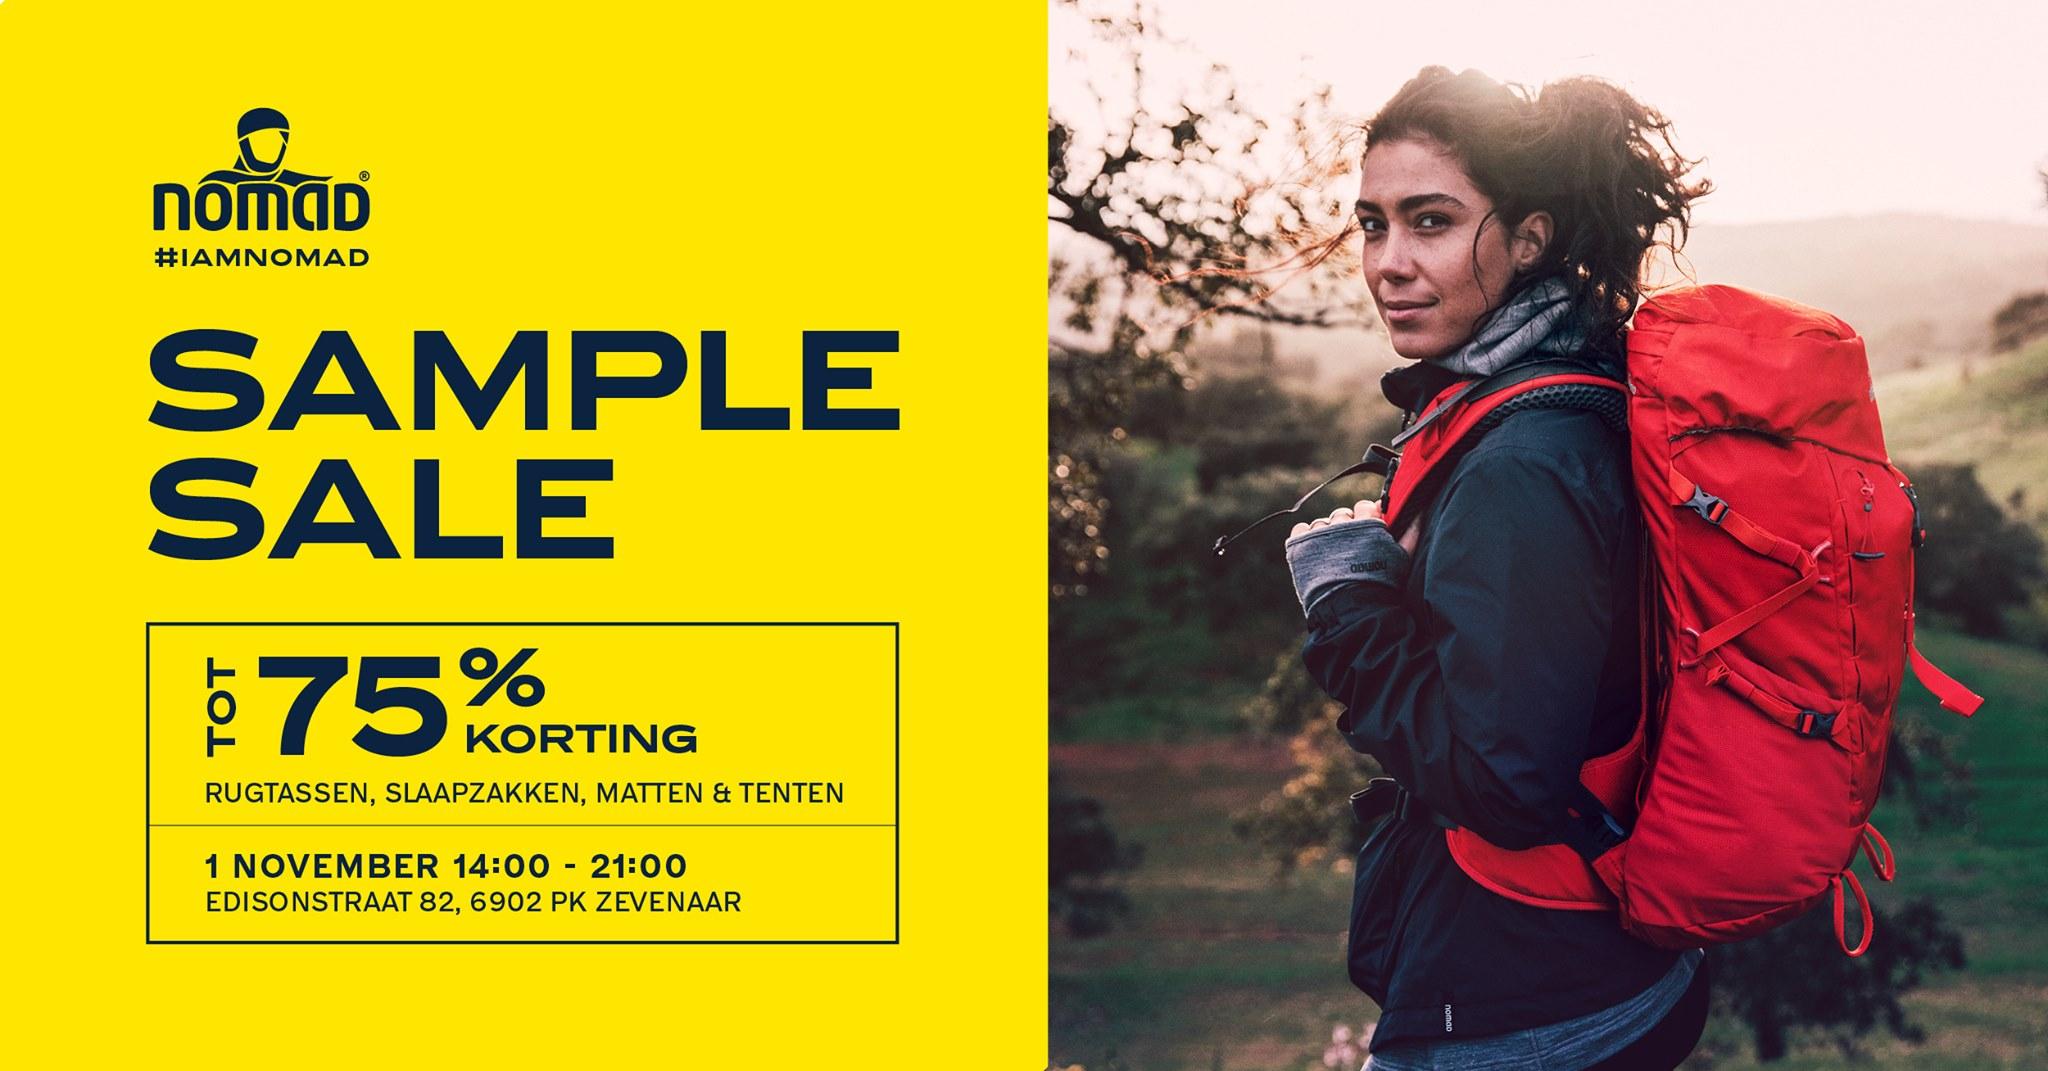 Nomad Sample Sale, vrijdag 1 november, tot 75% korting, Zevenaar